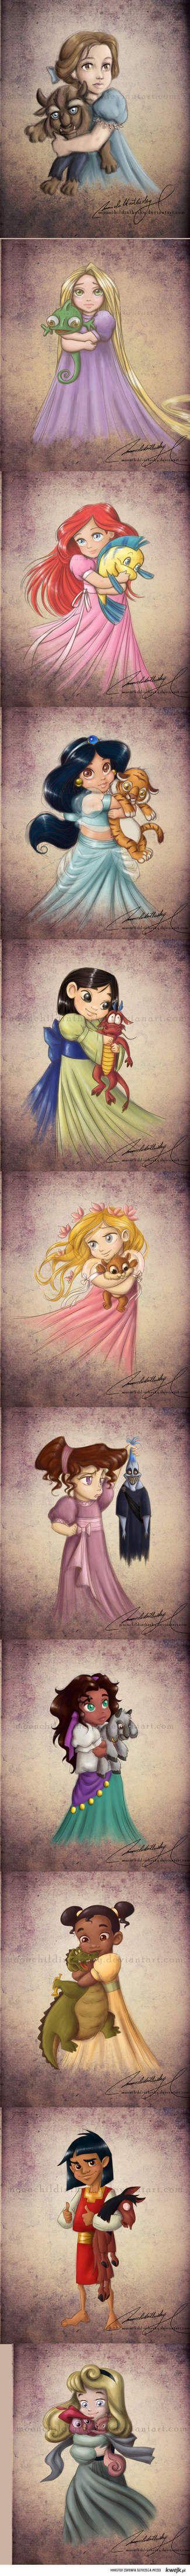 Super cute.  HAHA Kuzco is a princess!